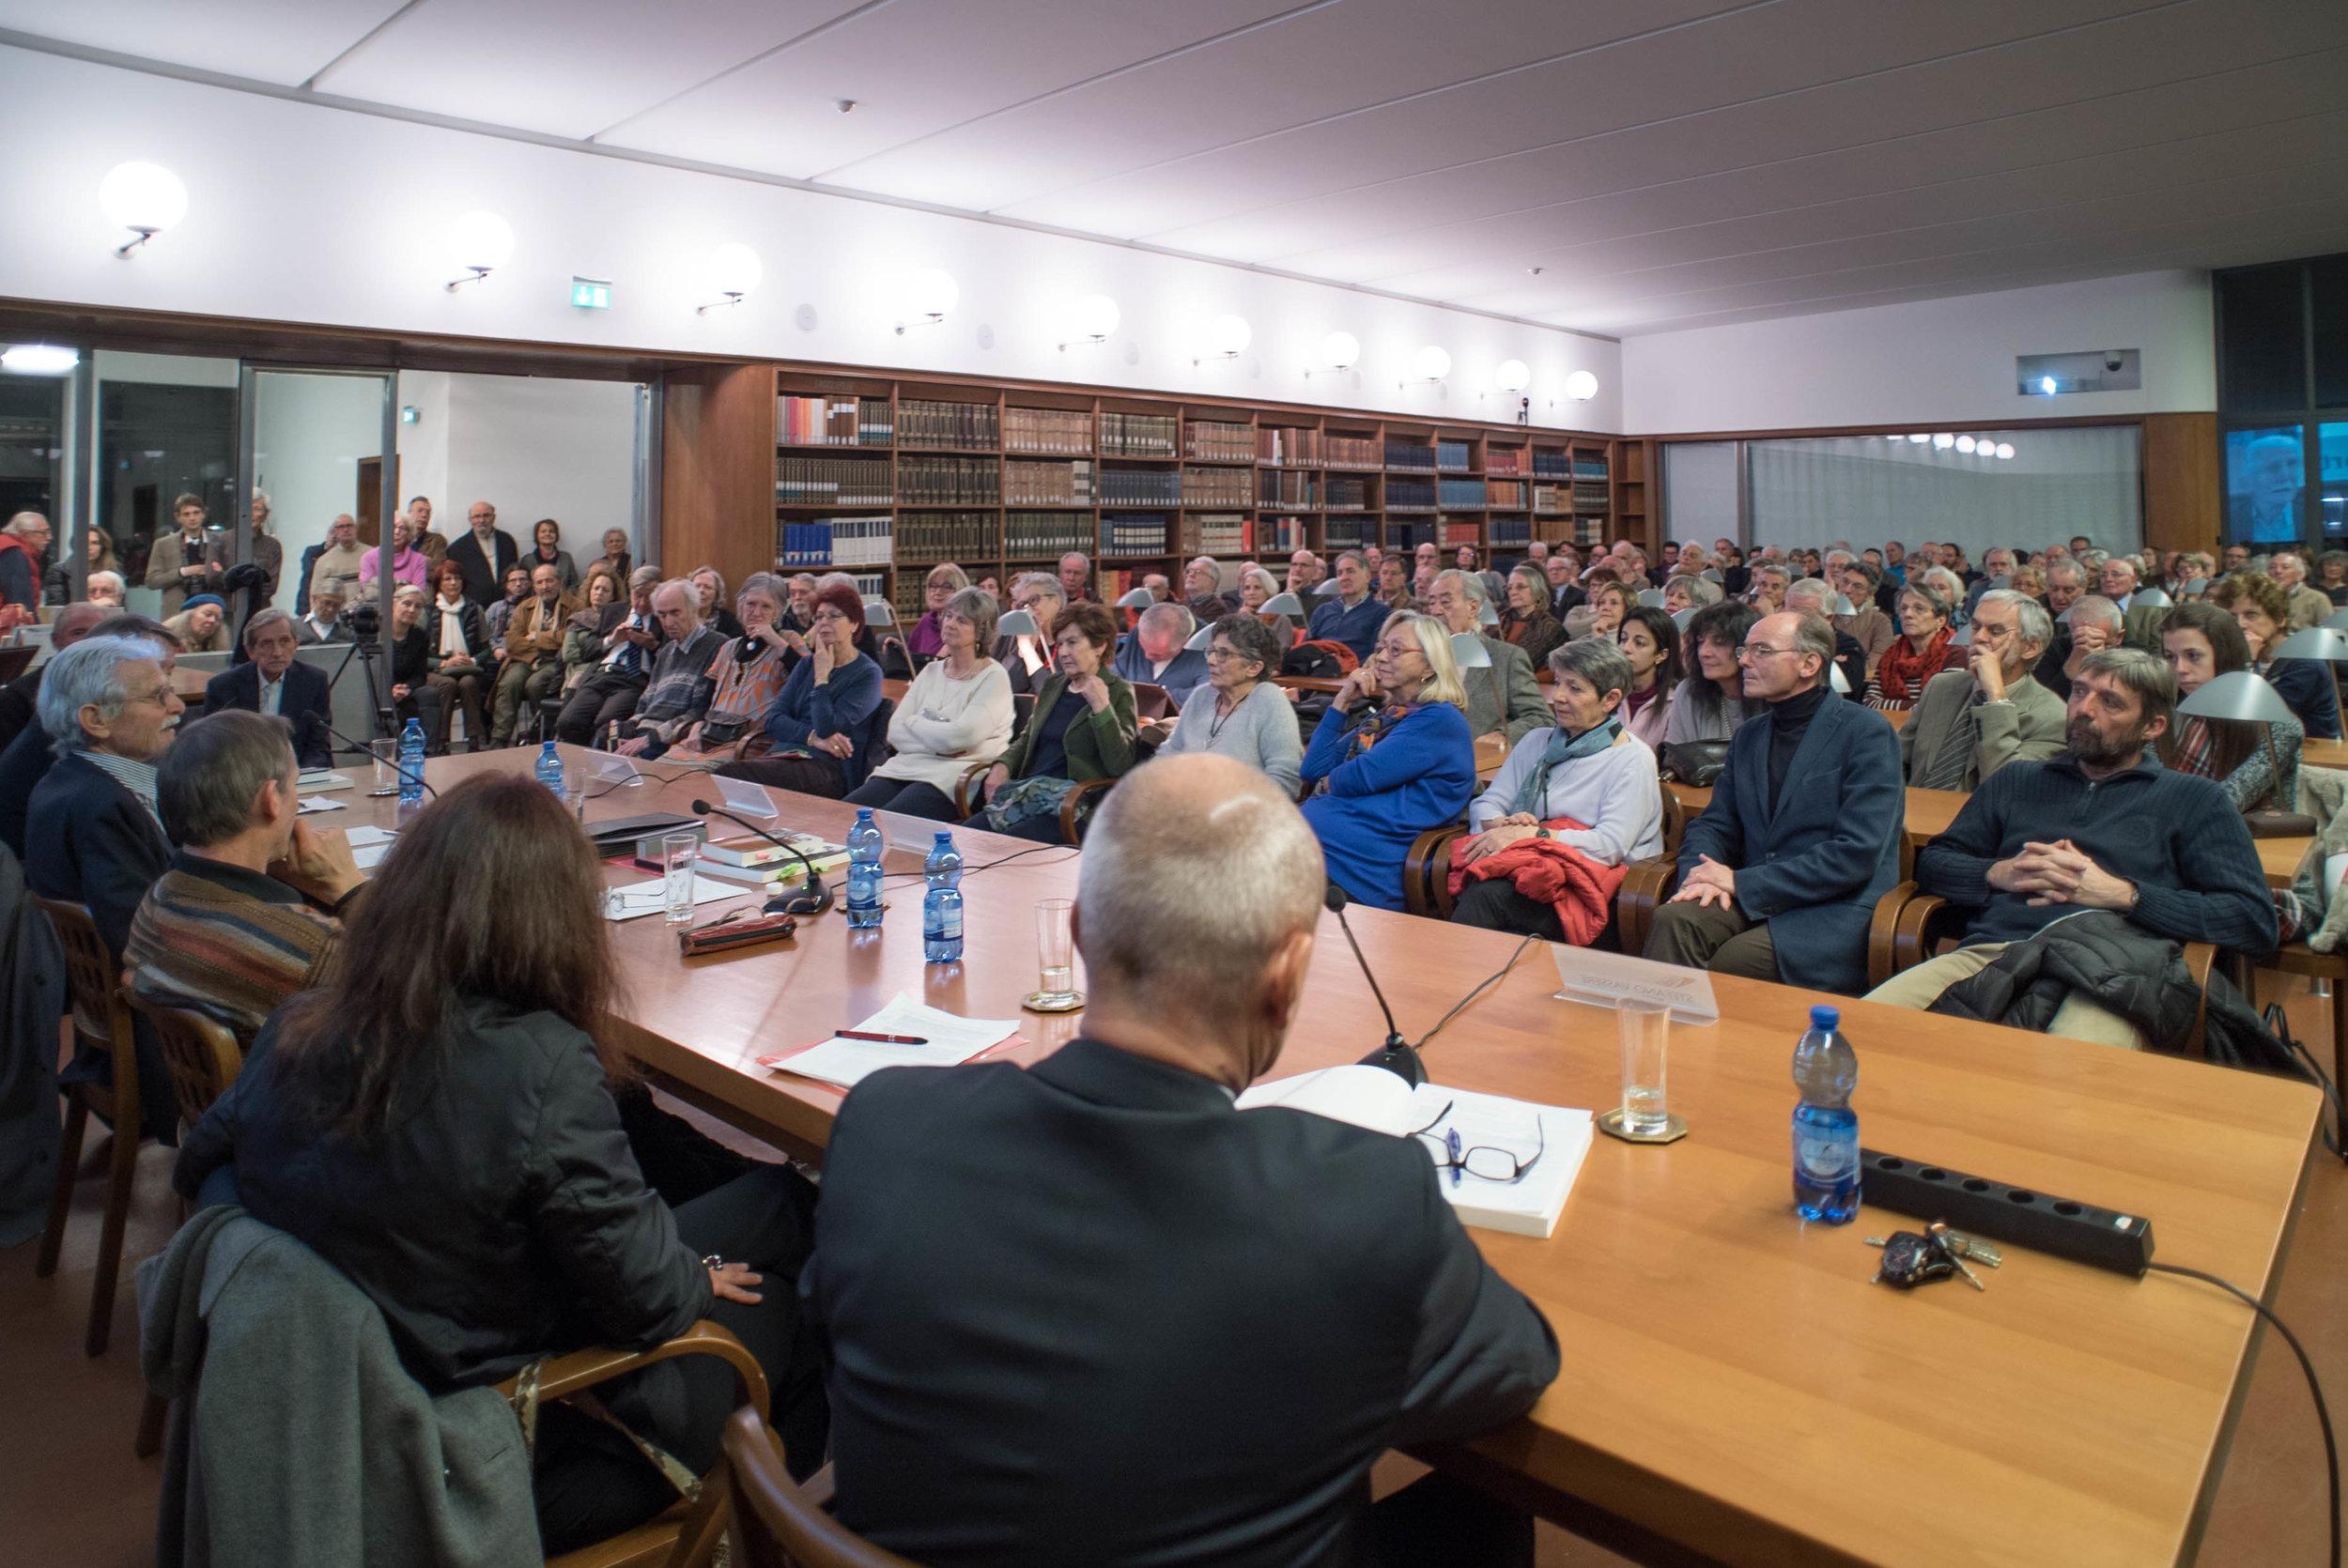 2018 02 08 Giardino dei Giusti - Guido Rivoir - Conferenza Lugano-00285.jpg